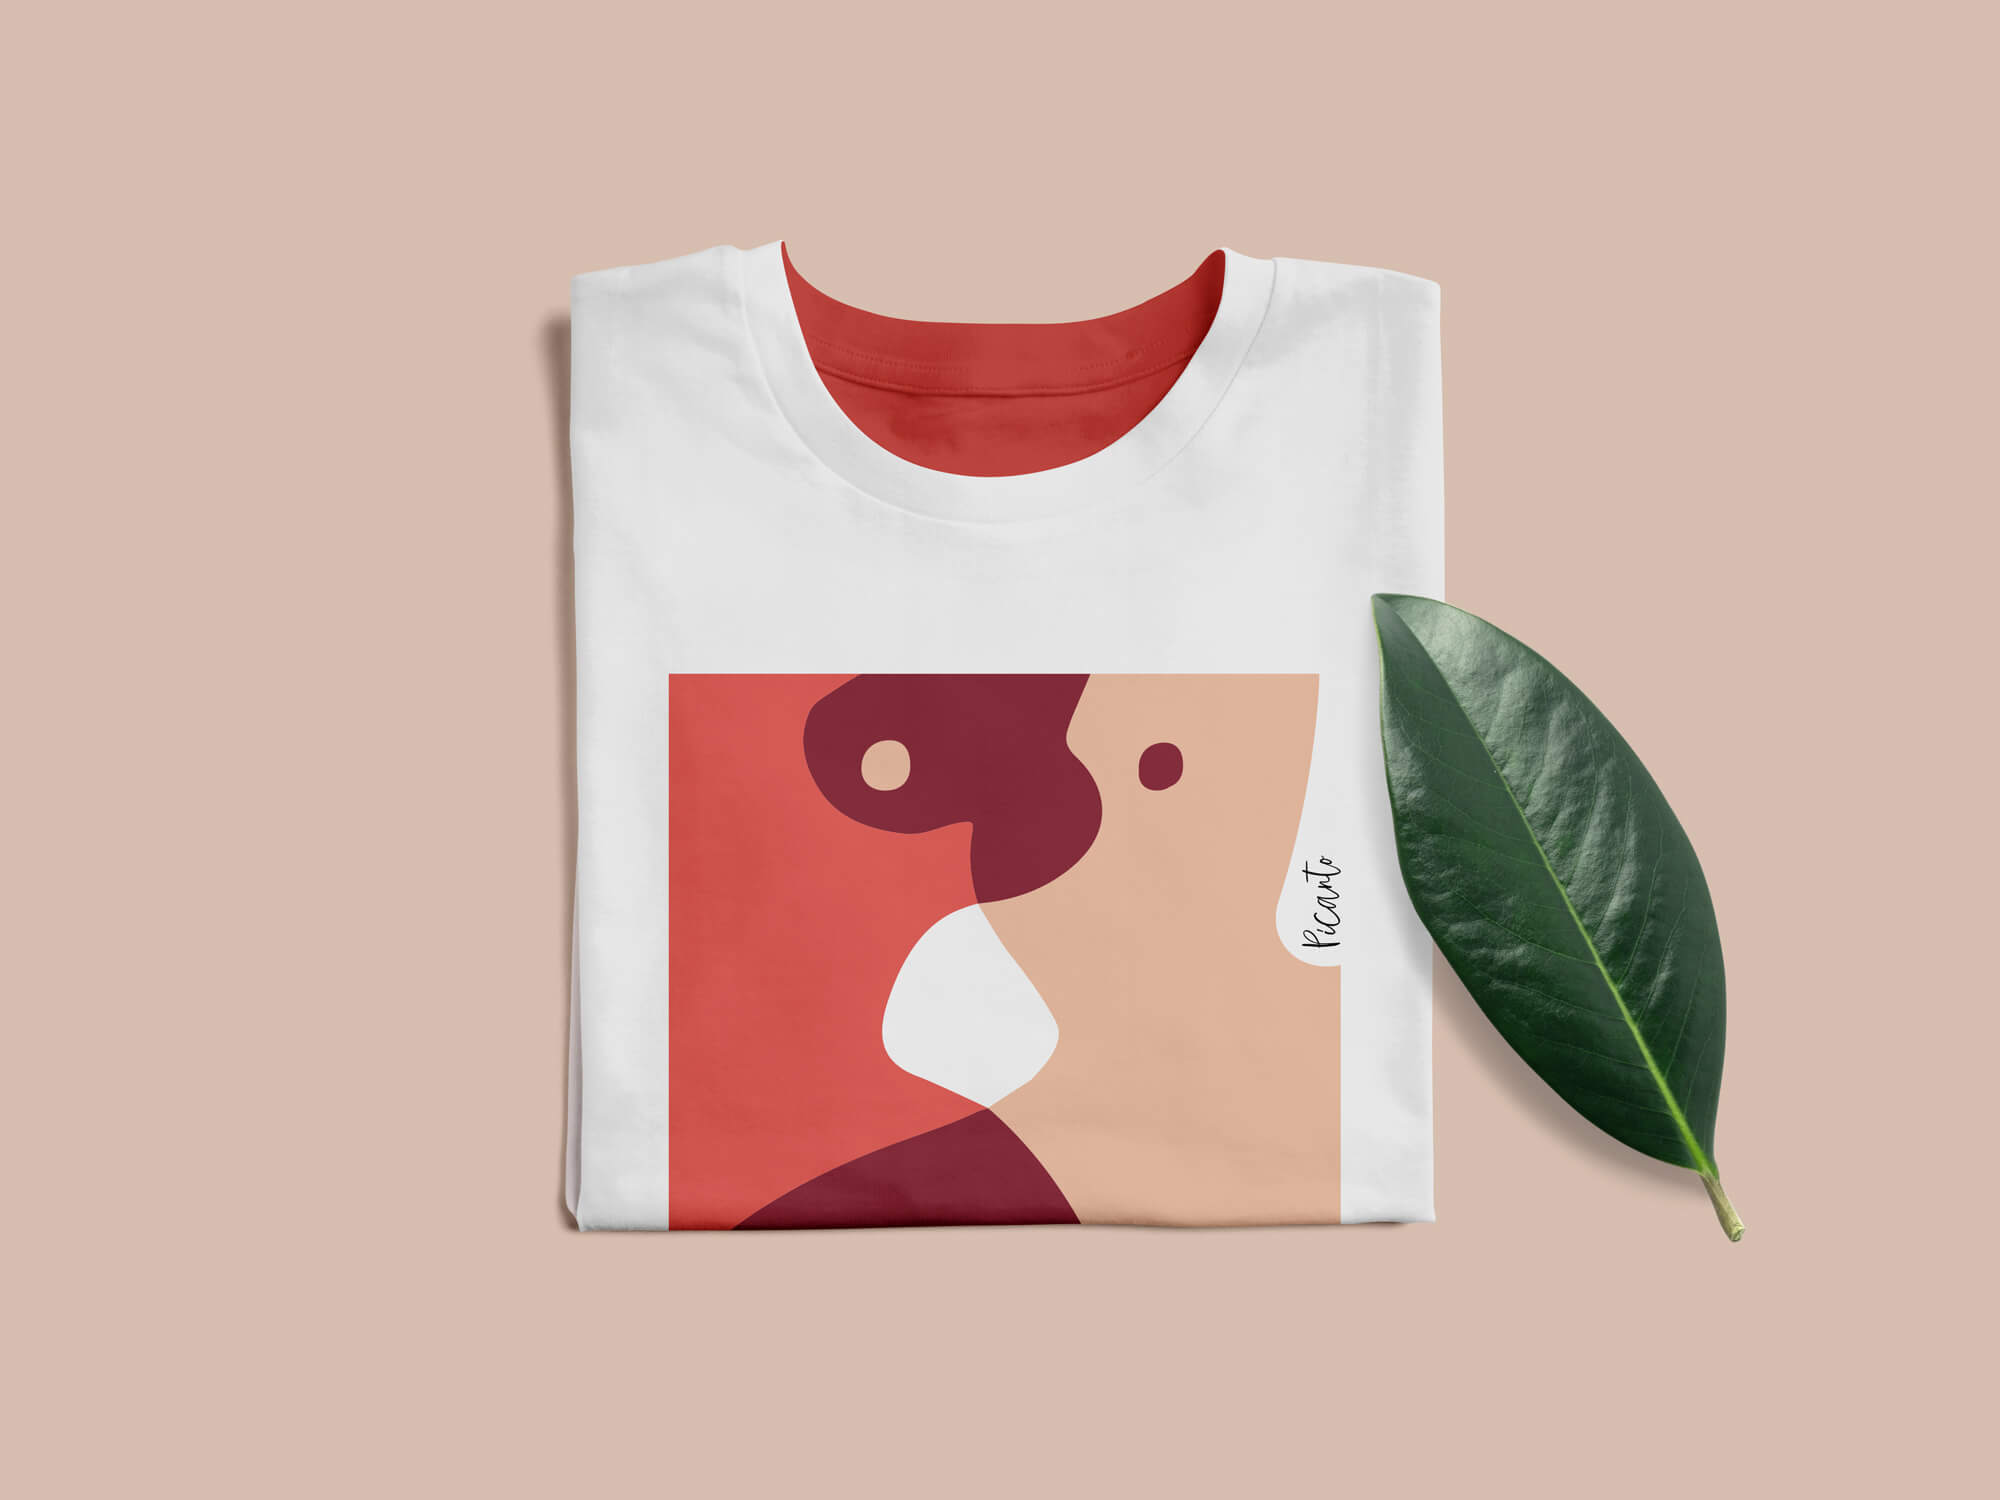 Фирменный стиль бренда Picanto - футболка